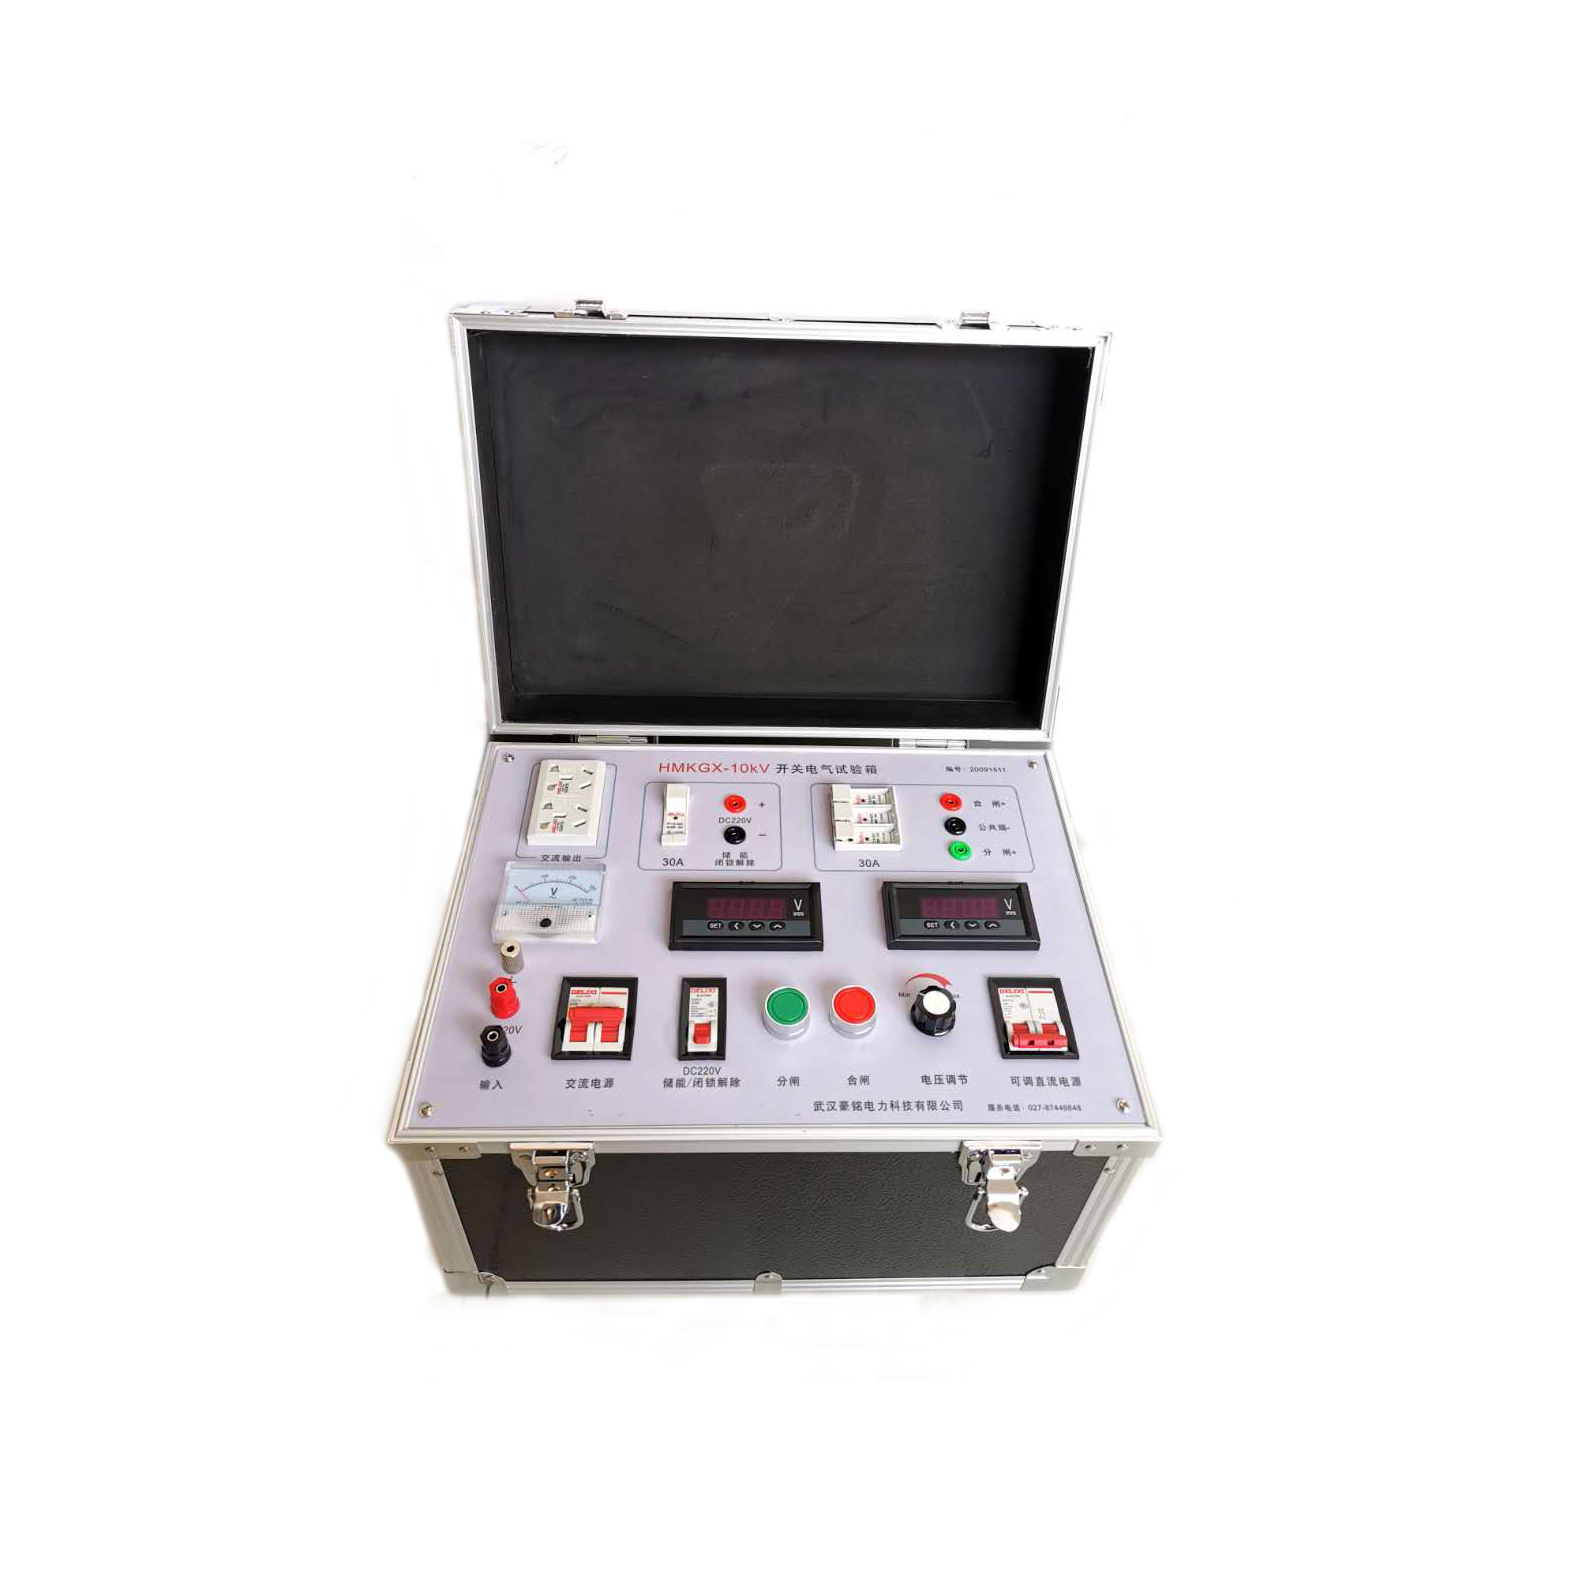 HMKGX-10kV  開關電氣試驗箱